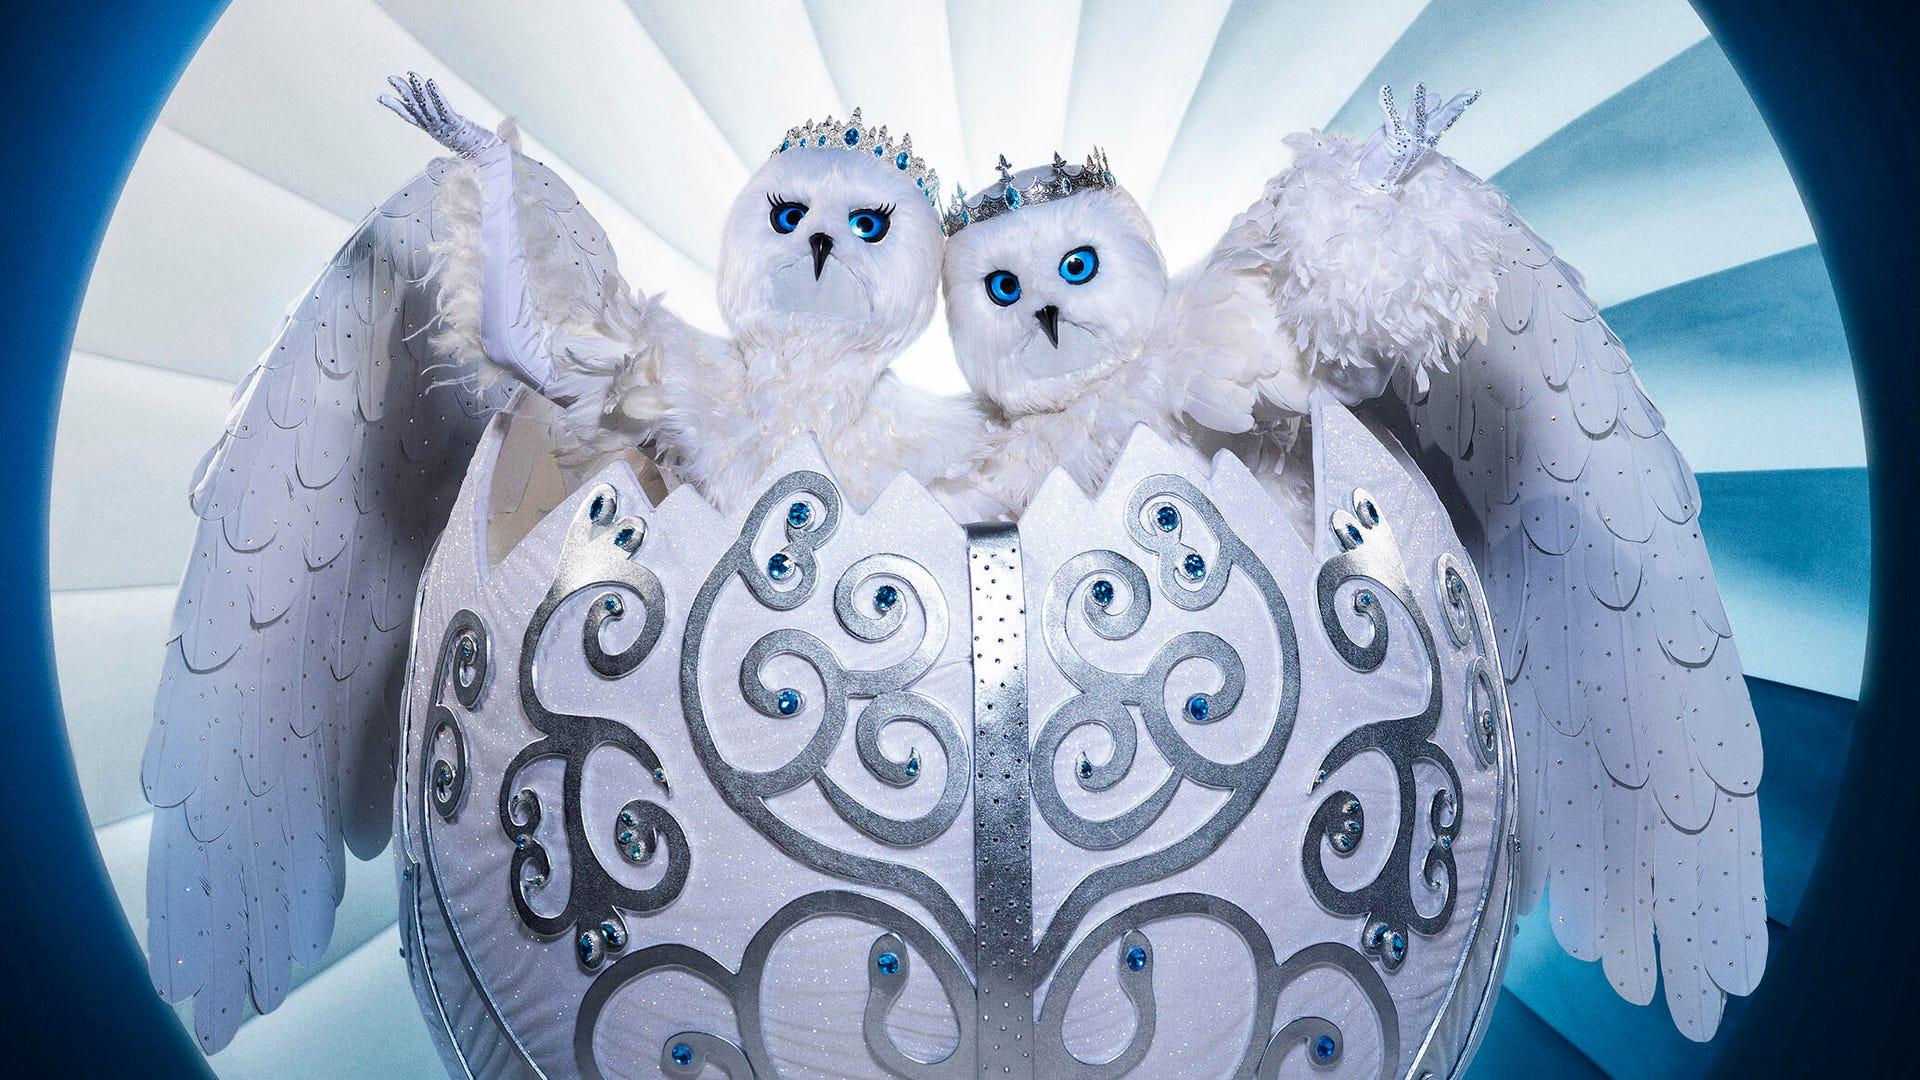 Snow Owls, The Masked Singer